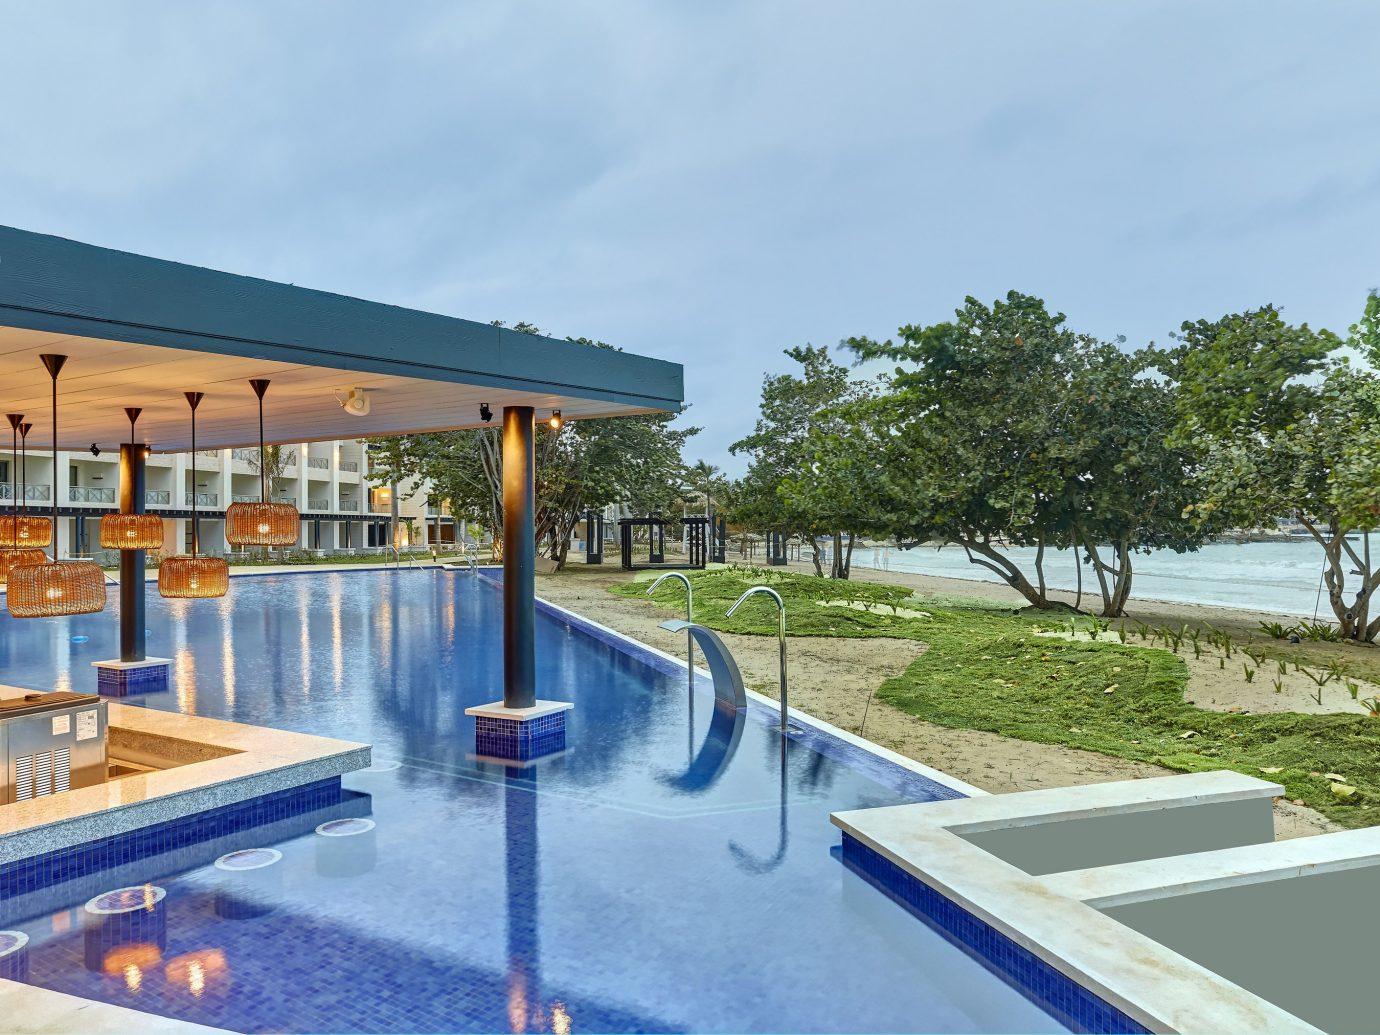 Hotels sky outdoor leisure swimming pool property Resort estate vacation real estate Villa home condominium backyard shore